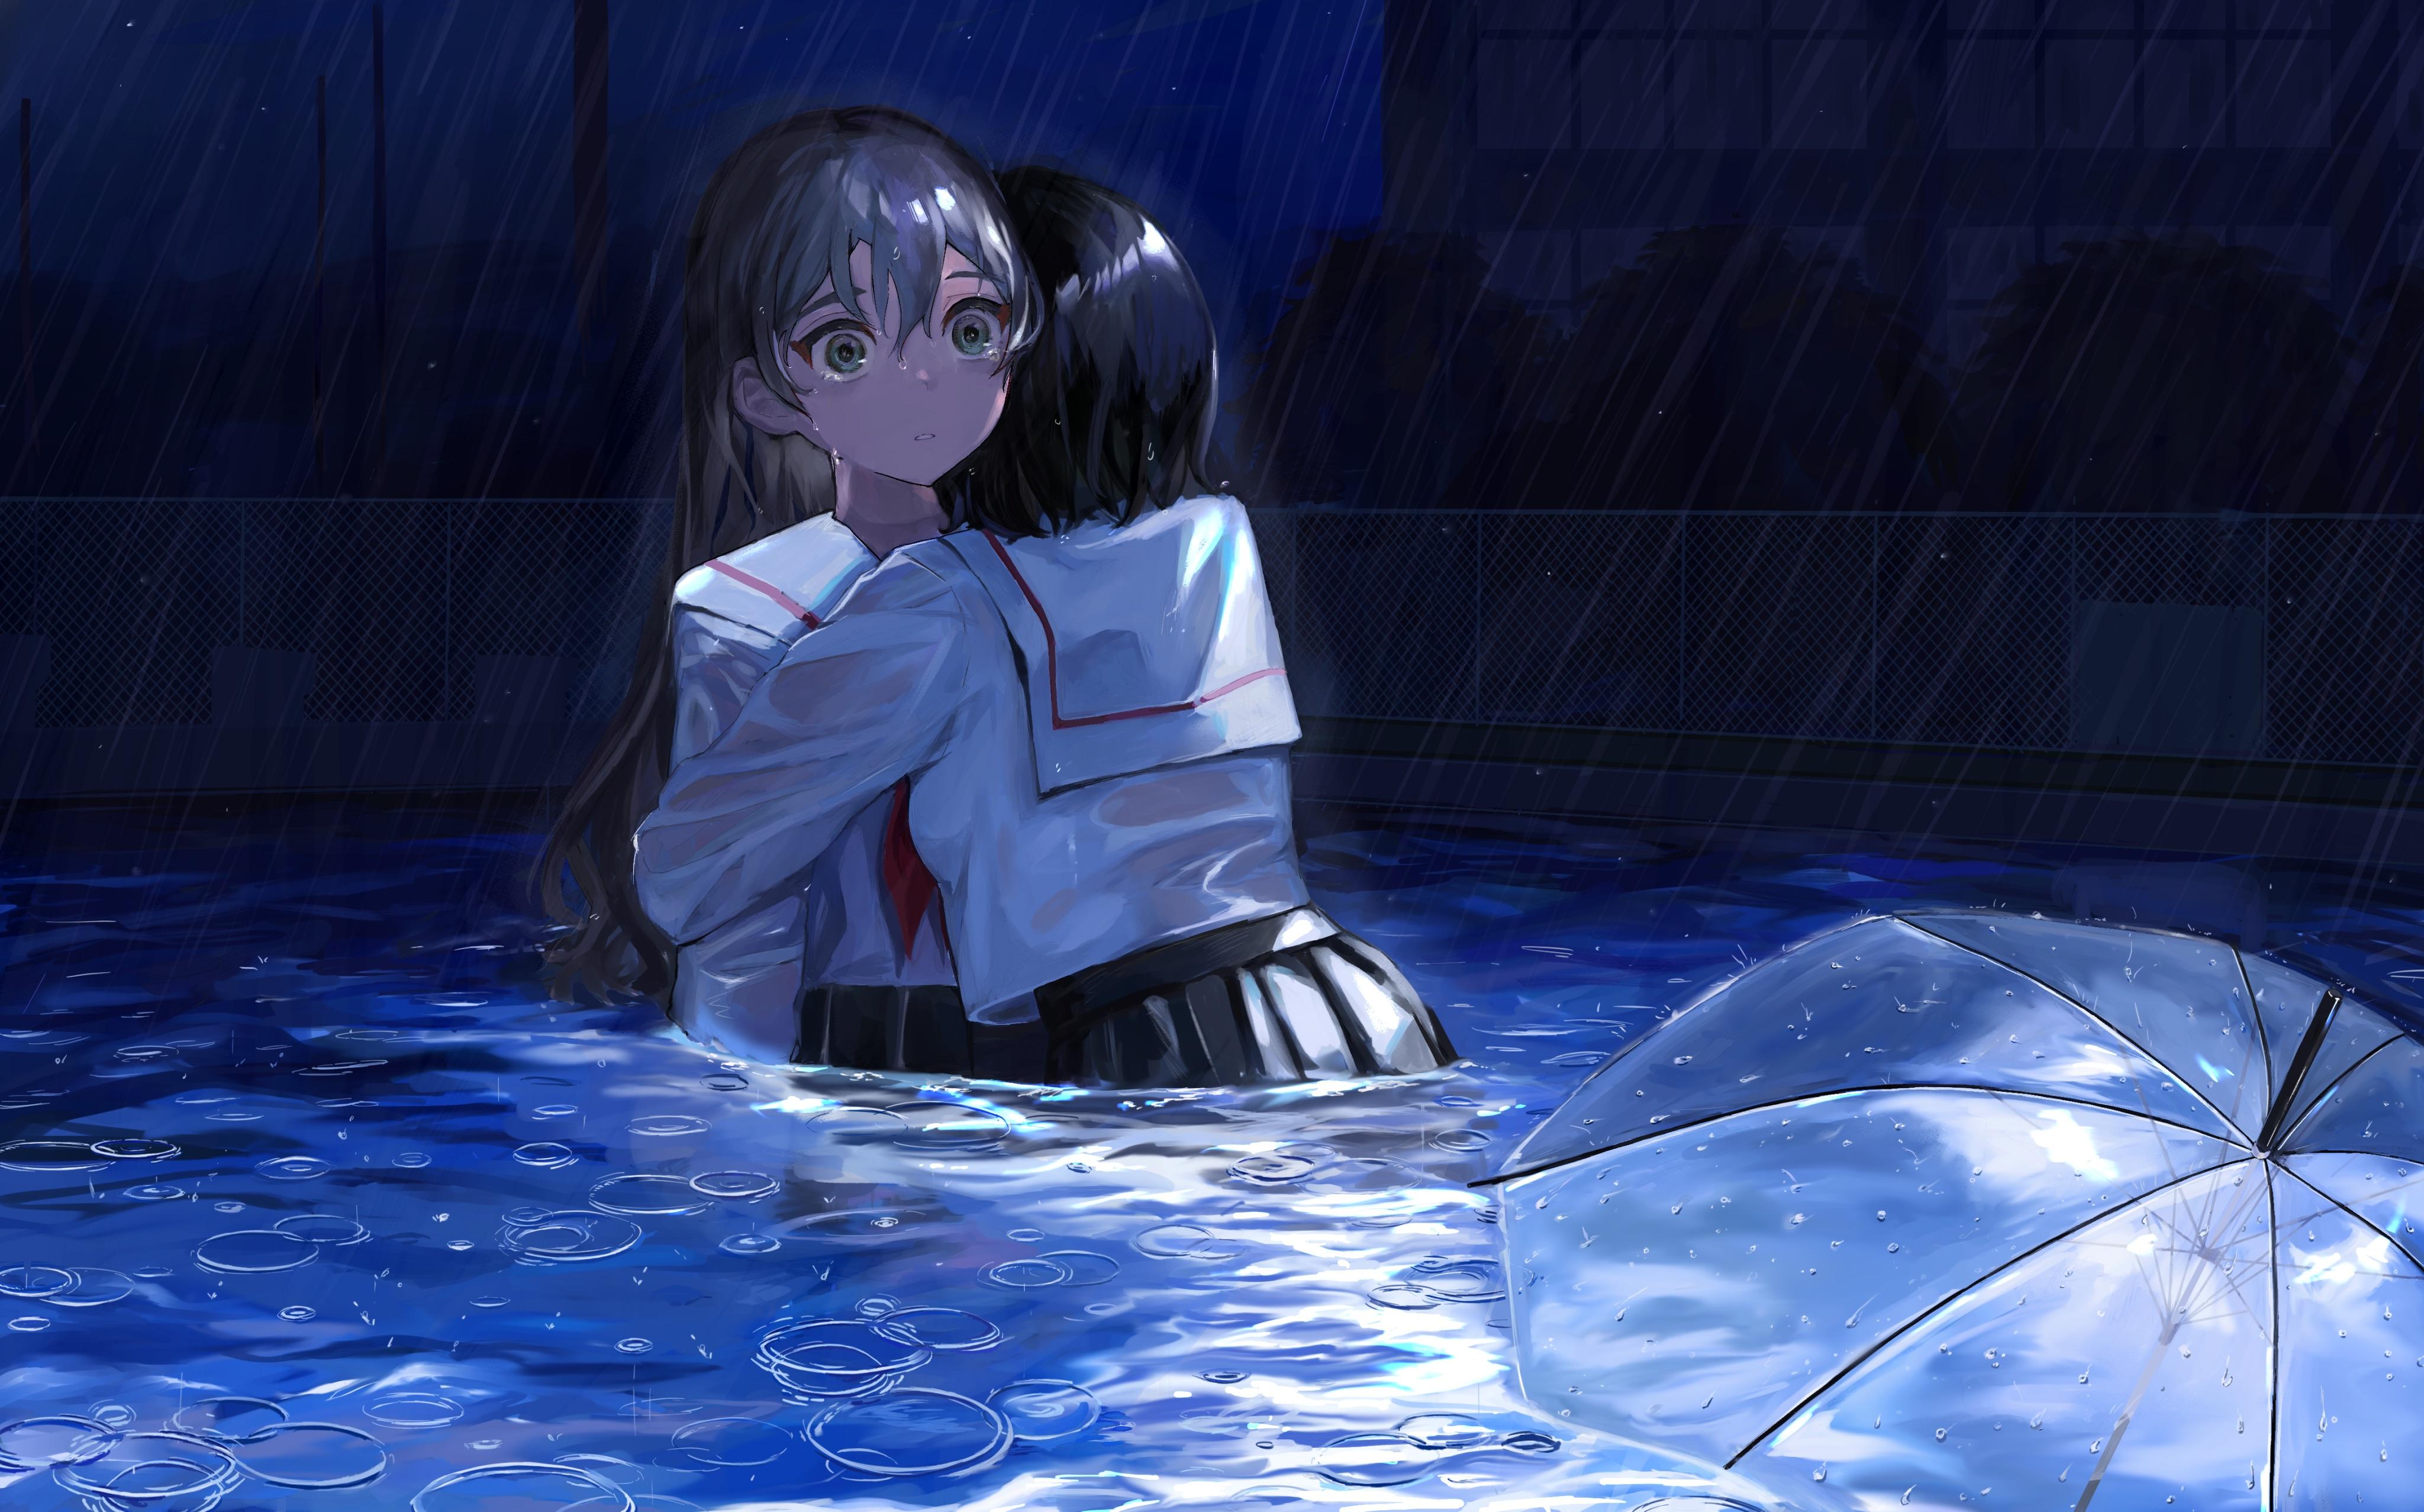 Mikanoisi Umbrella Anime Anime Girls Swimming Pool Rain Sailor Uniform Hugging Tears 4096x2555